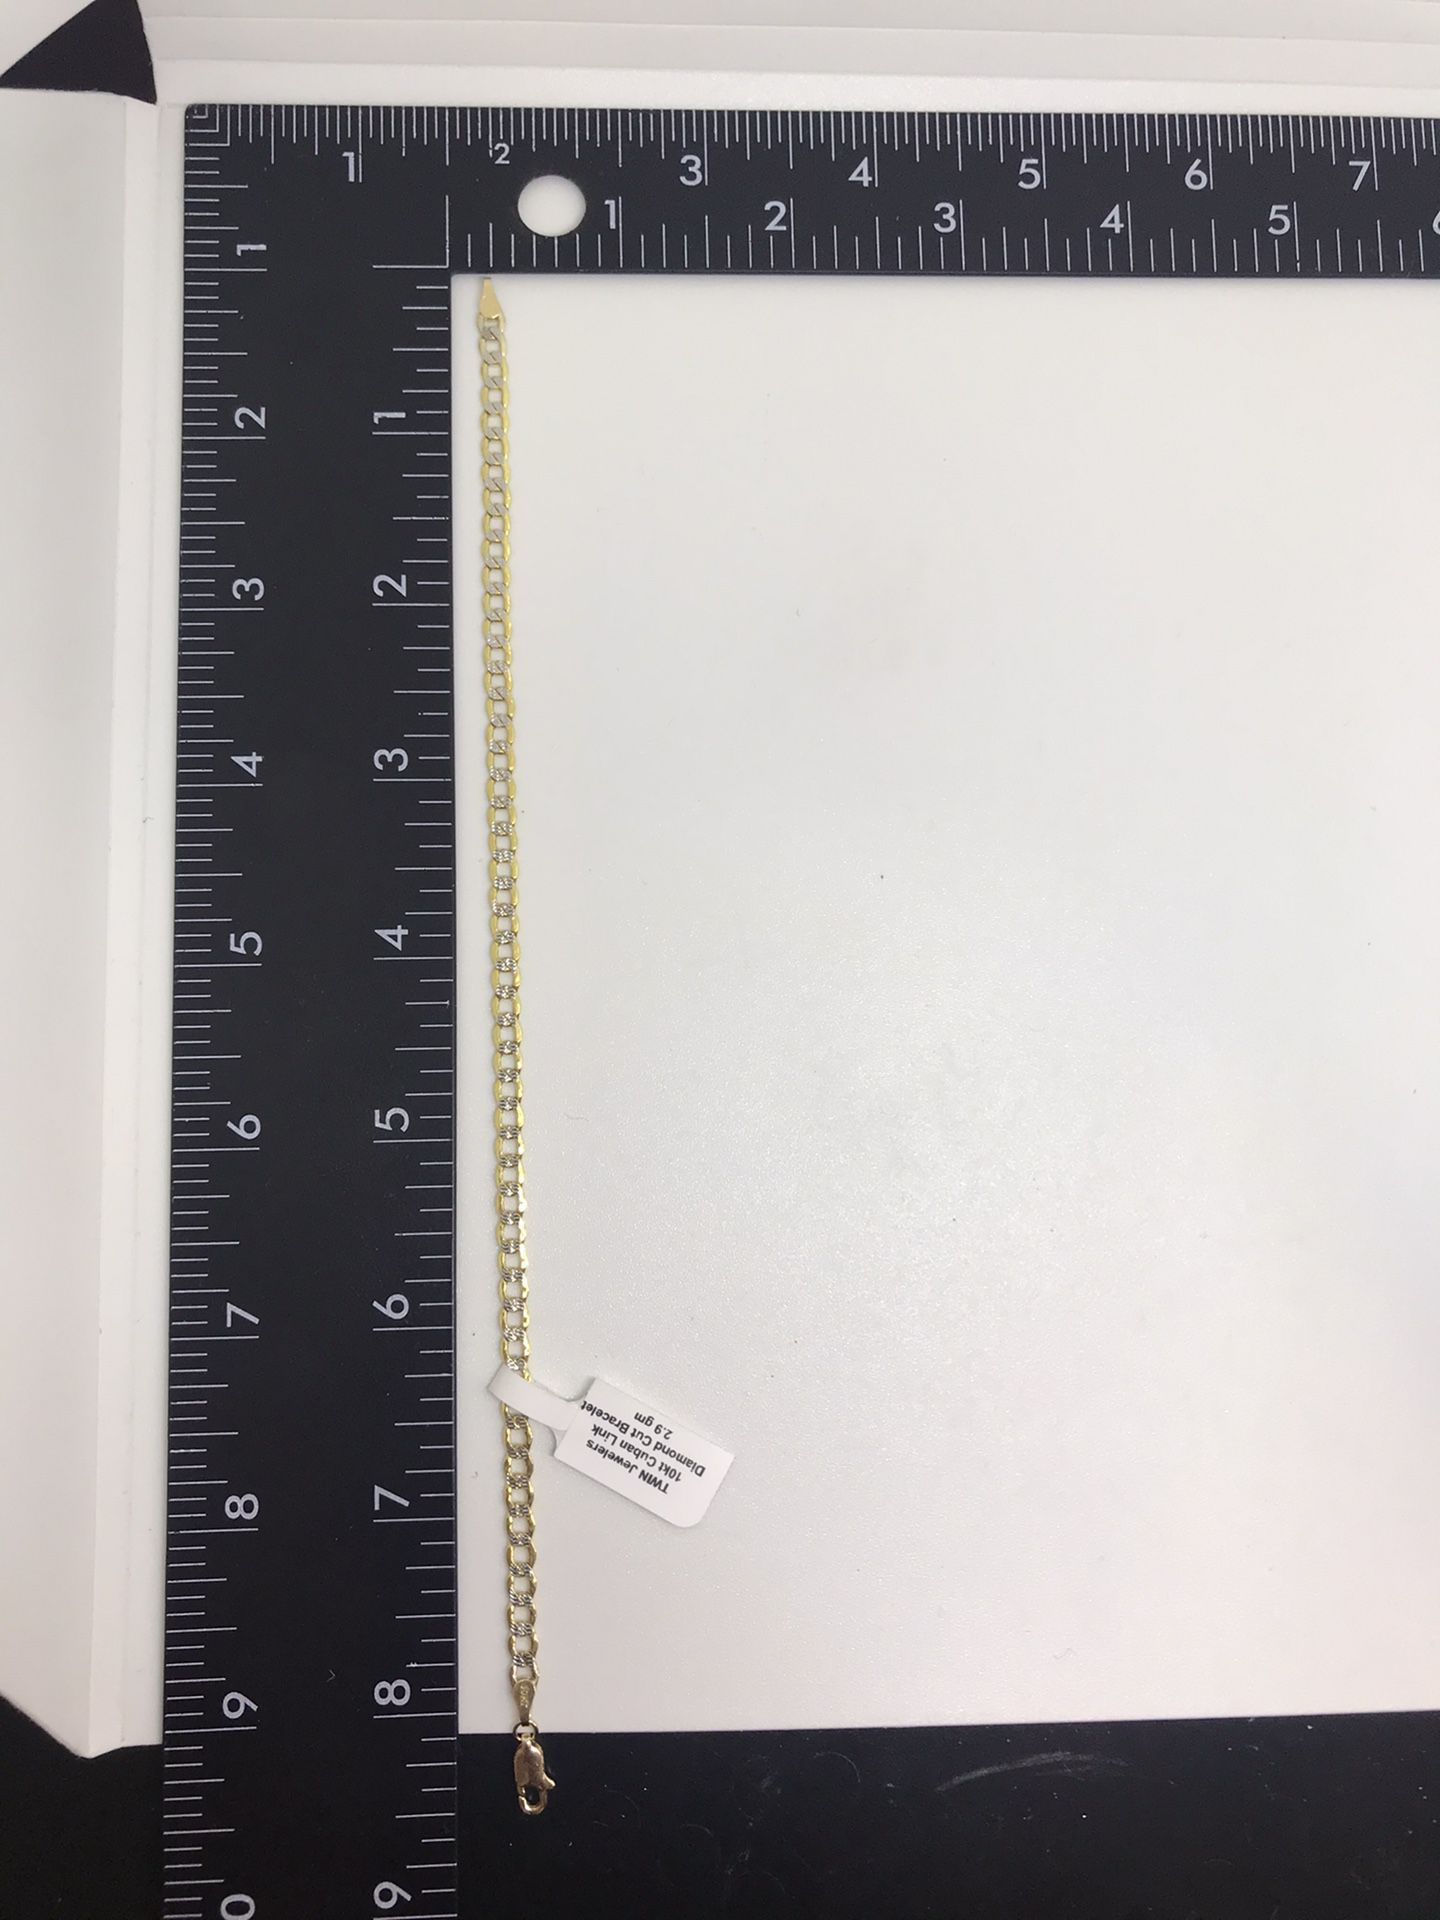 10Kt Gold Diamond cut bracelet available on special offer